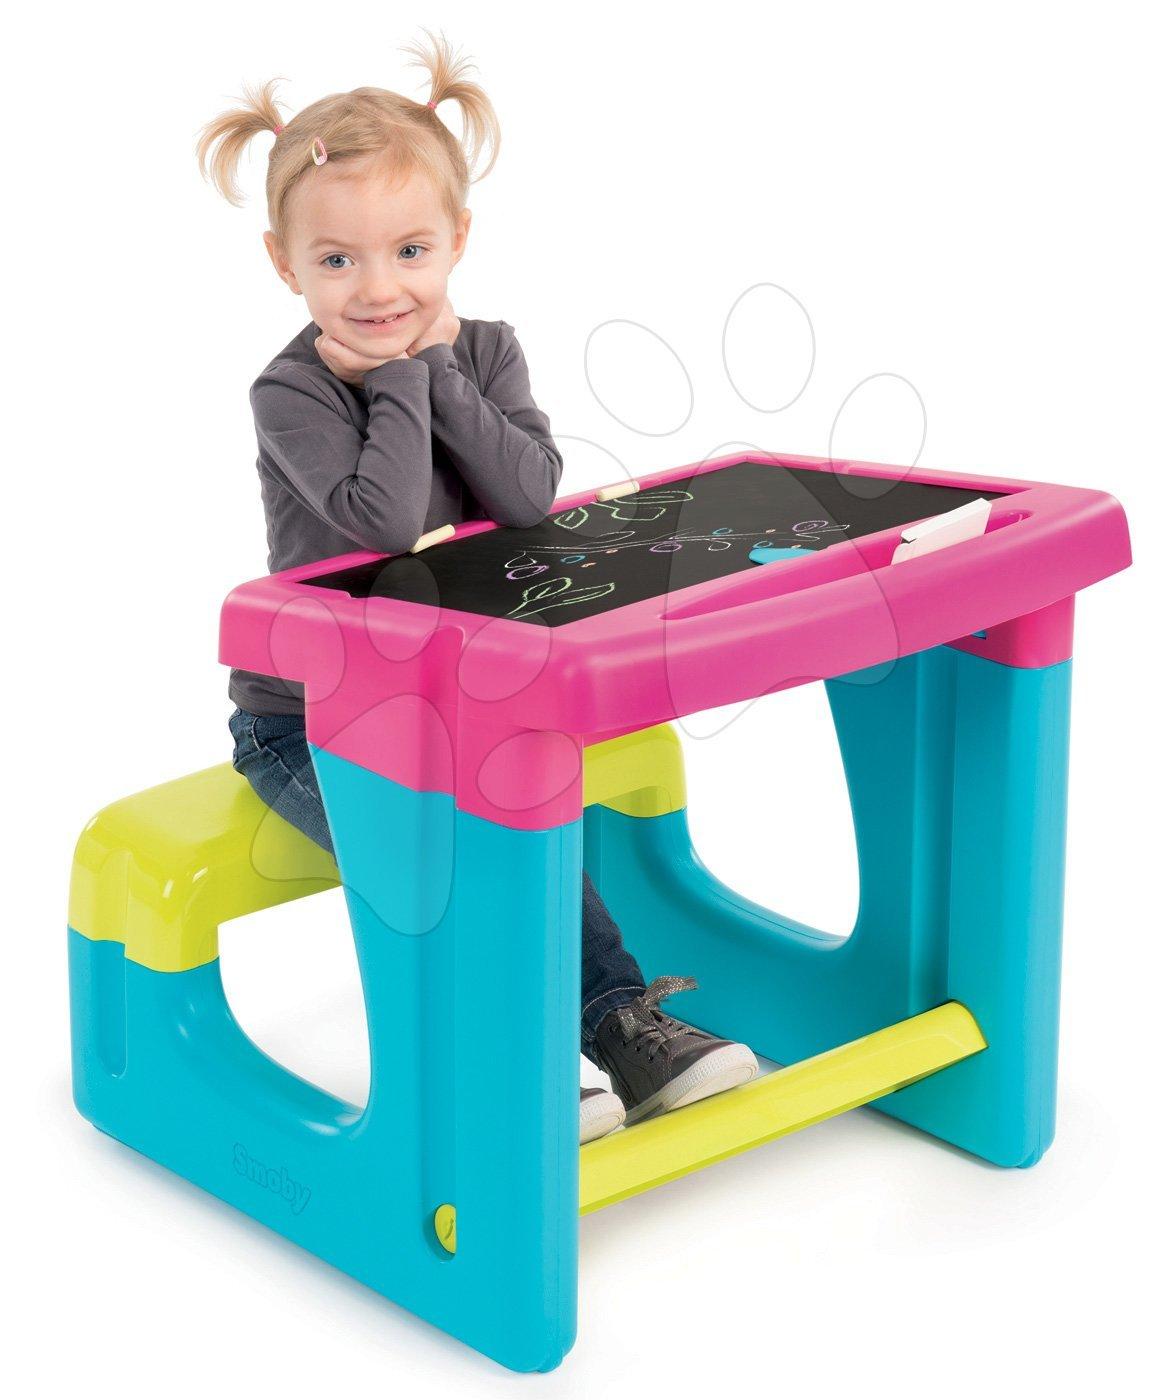 Školská lavica s odkladacím priestorom a obojstrannou tabuľou Activity  Smoby s 8 doplnkami 420102 ružová 42a9f2ce768